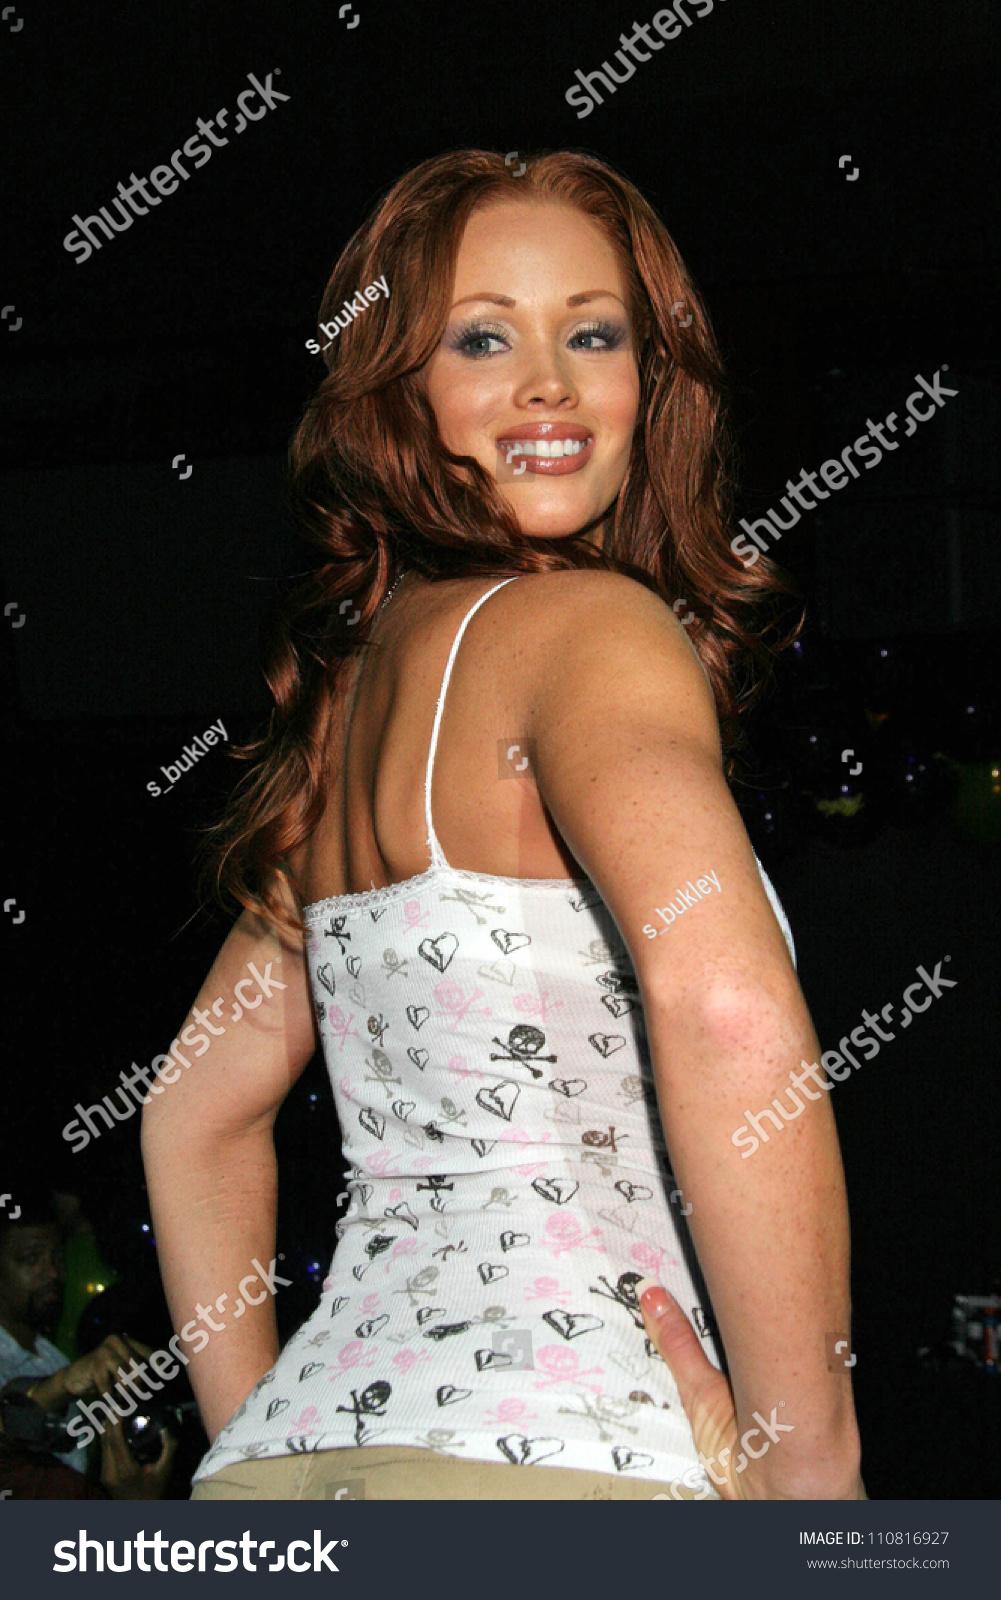 Celebrites Christine Mercedes nudes (75 photo), Pussy, Hot, Feet, lingerie 2017